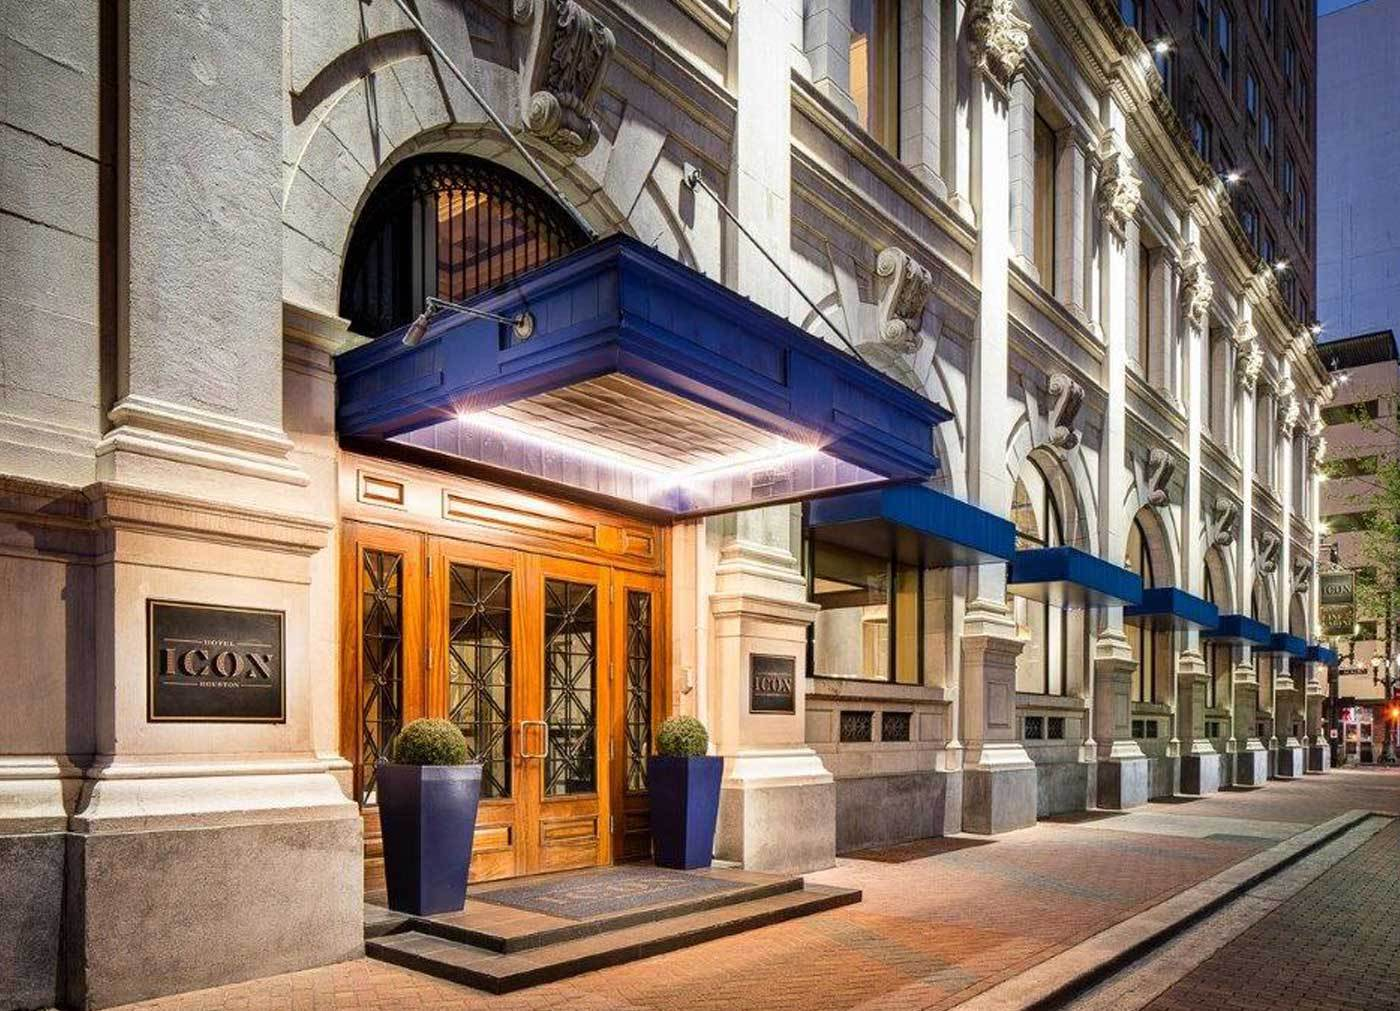 Hotel-ICON---Congress-Street-entrance_0.jpg